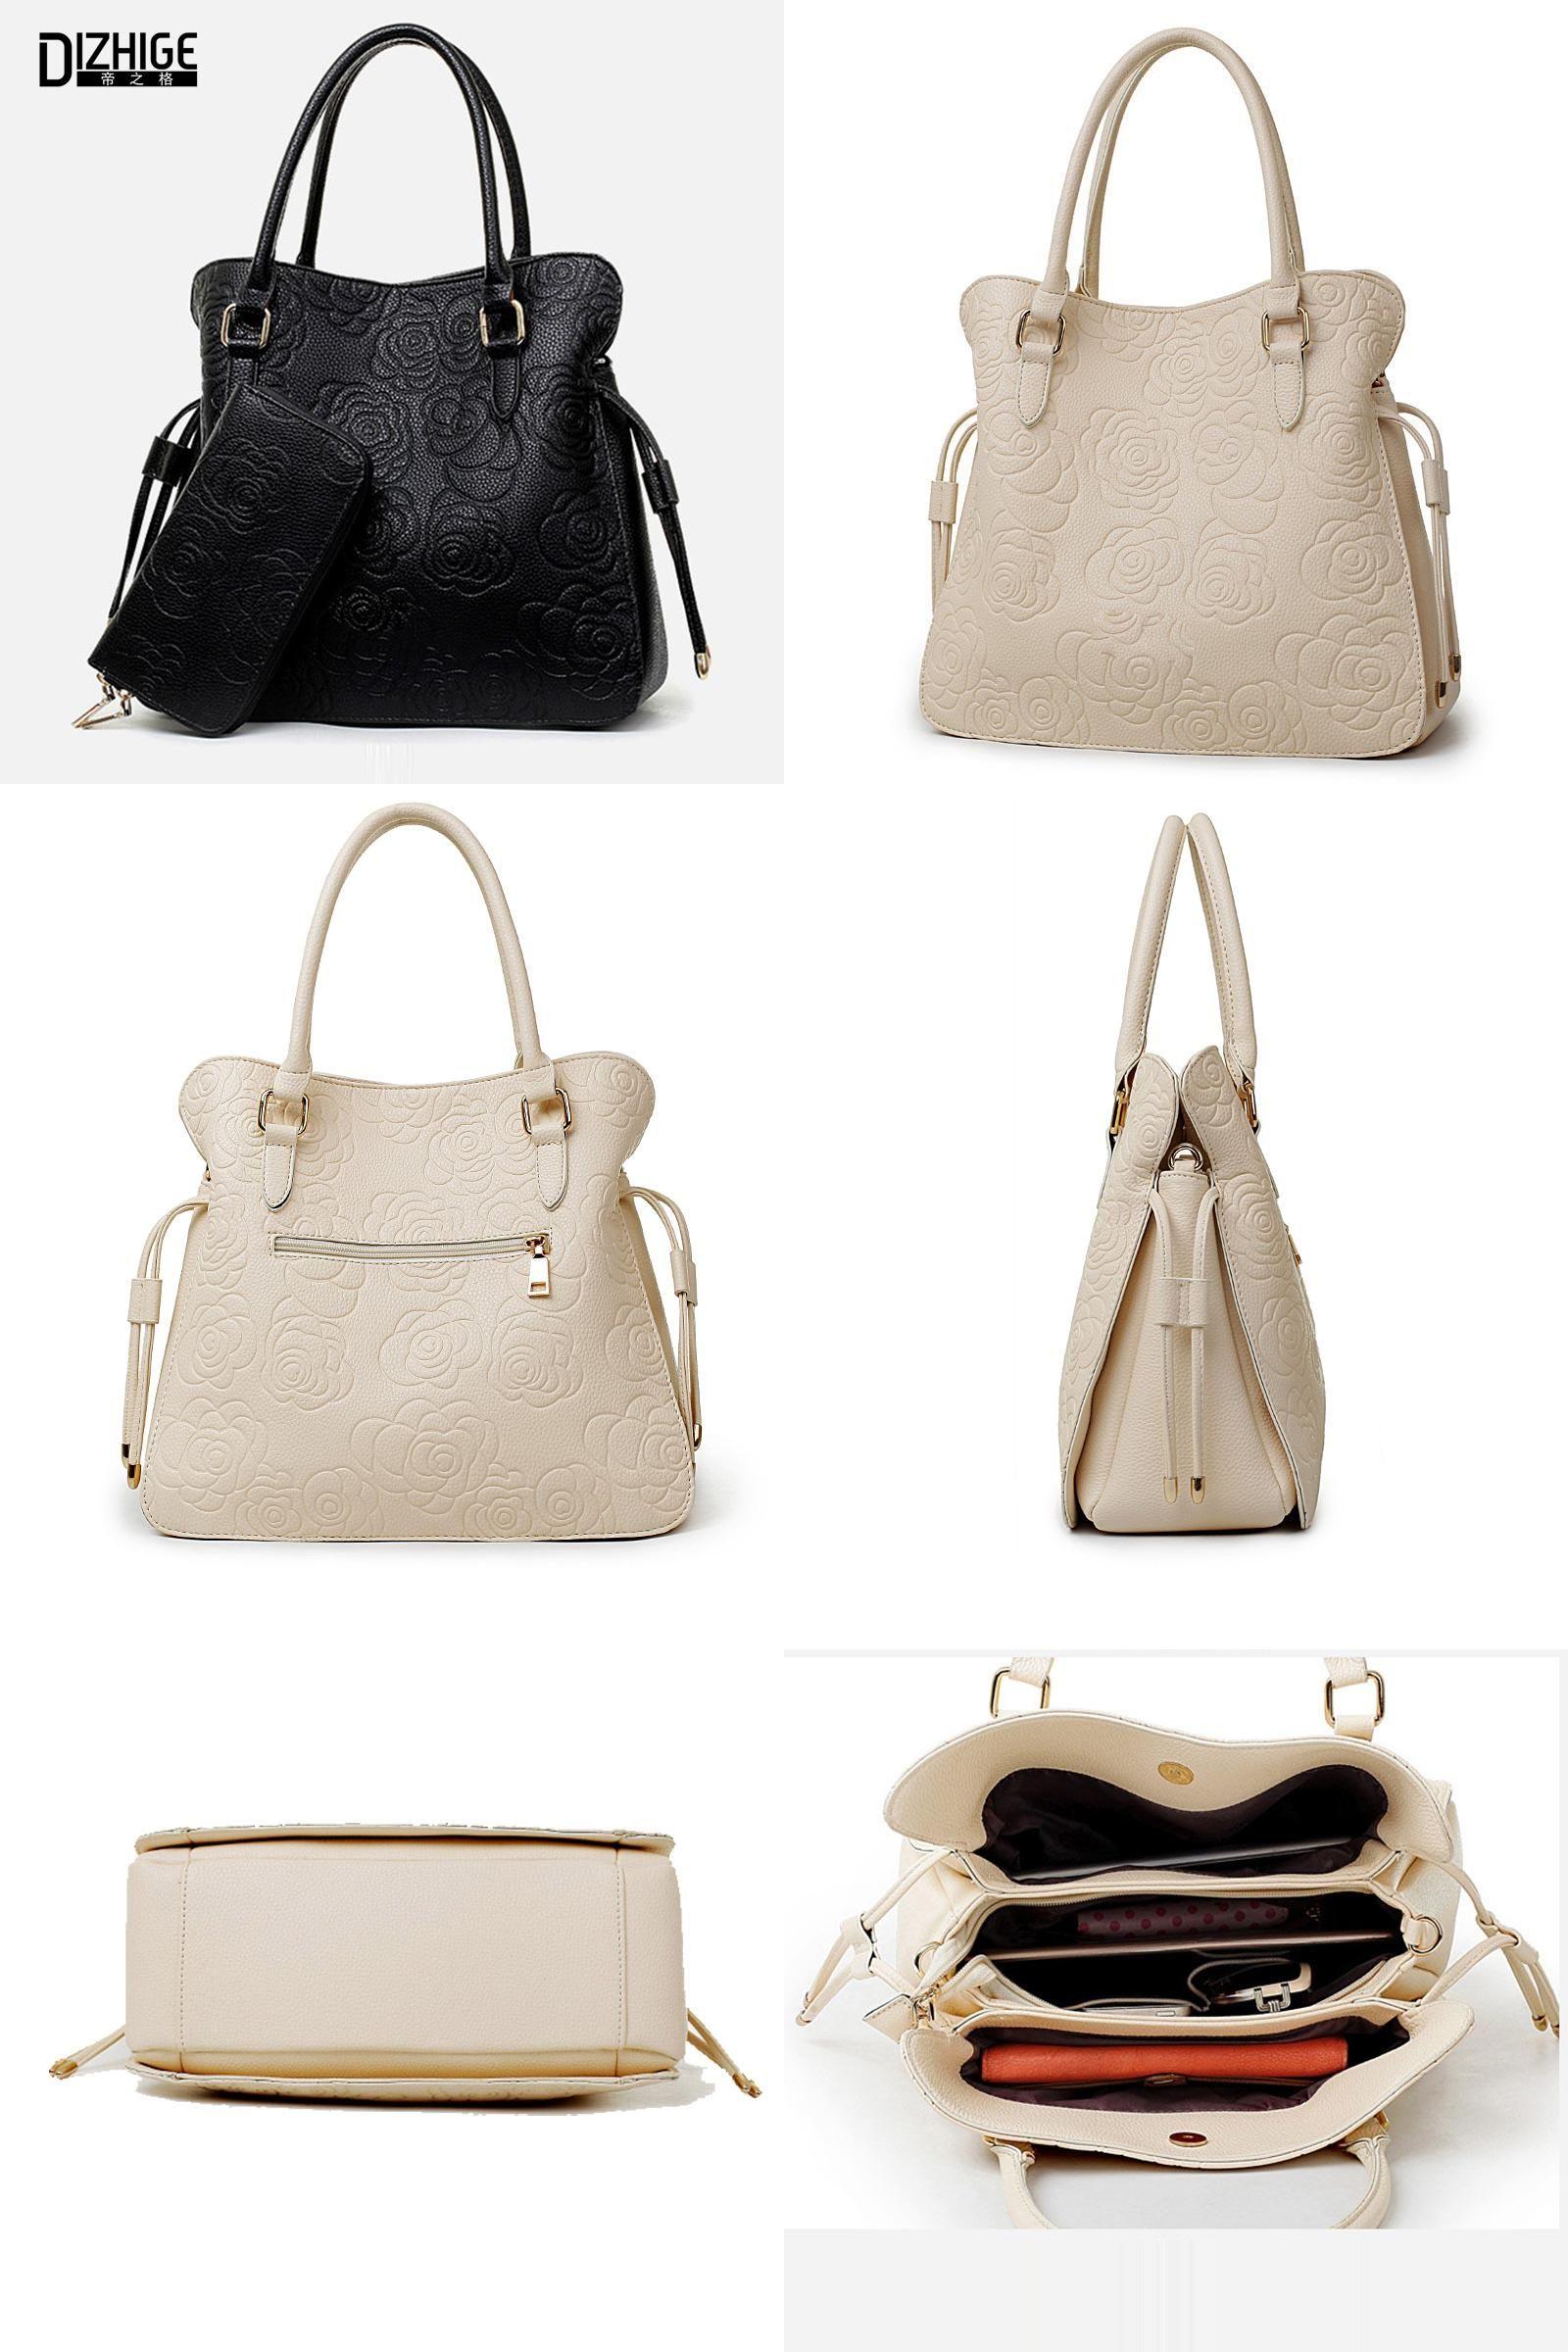 [Visit to Buy] Print Rose PU Leather Bags For Women Handbags Designer Purses And Handbags Ladies Shoulder Bag Luxury Hand Bag Feminina Sac #Advertisement